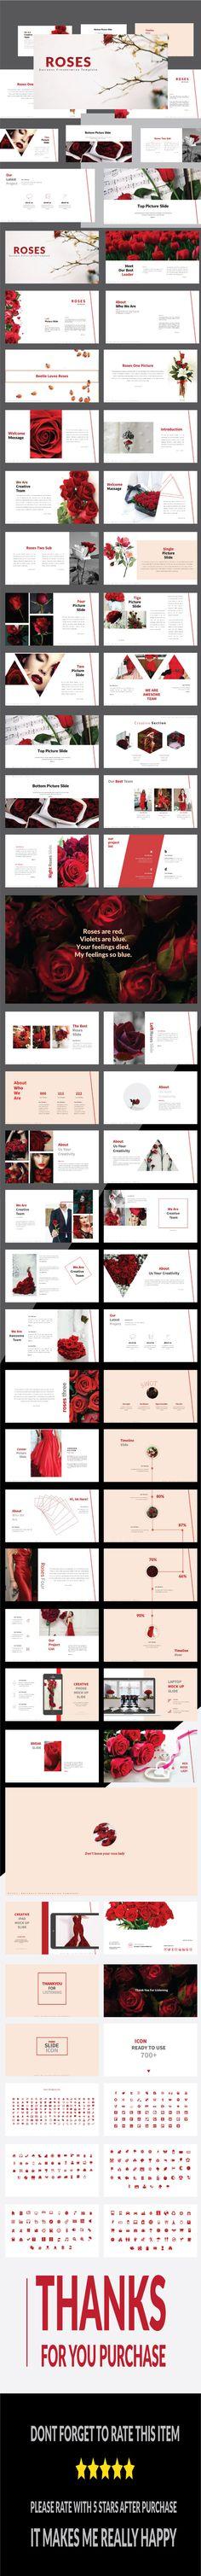 Roses - Multipurpose PowerPoint Template